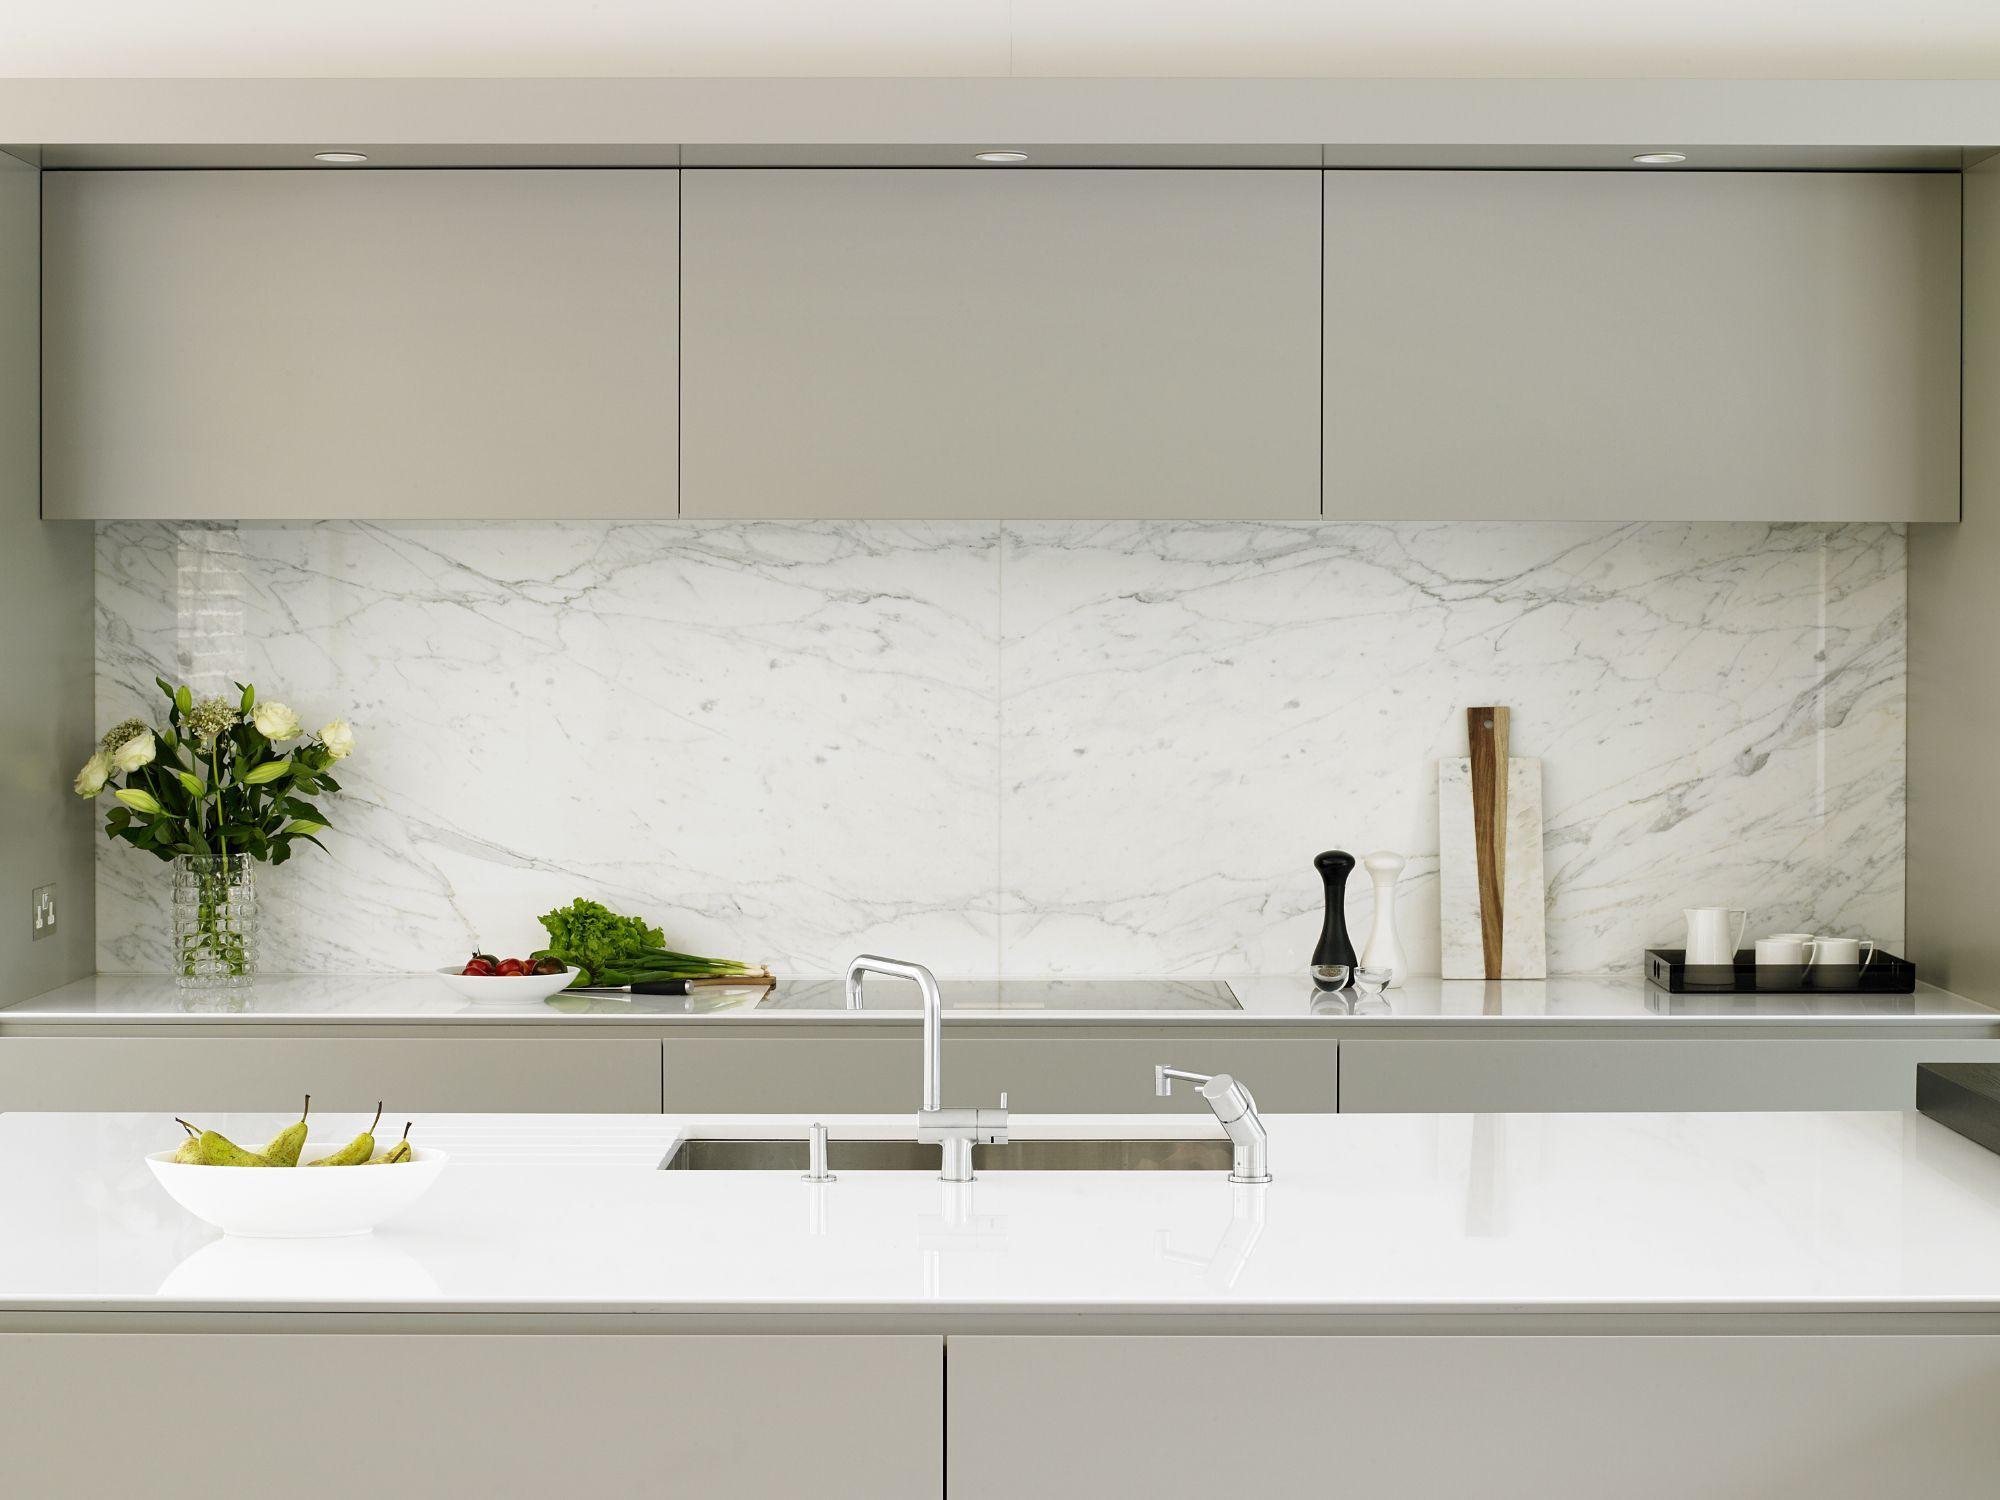 Wandsworth kitchen - cabinets, calacatta marble splashback and ...